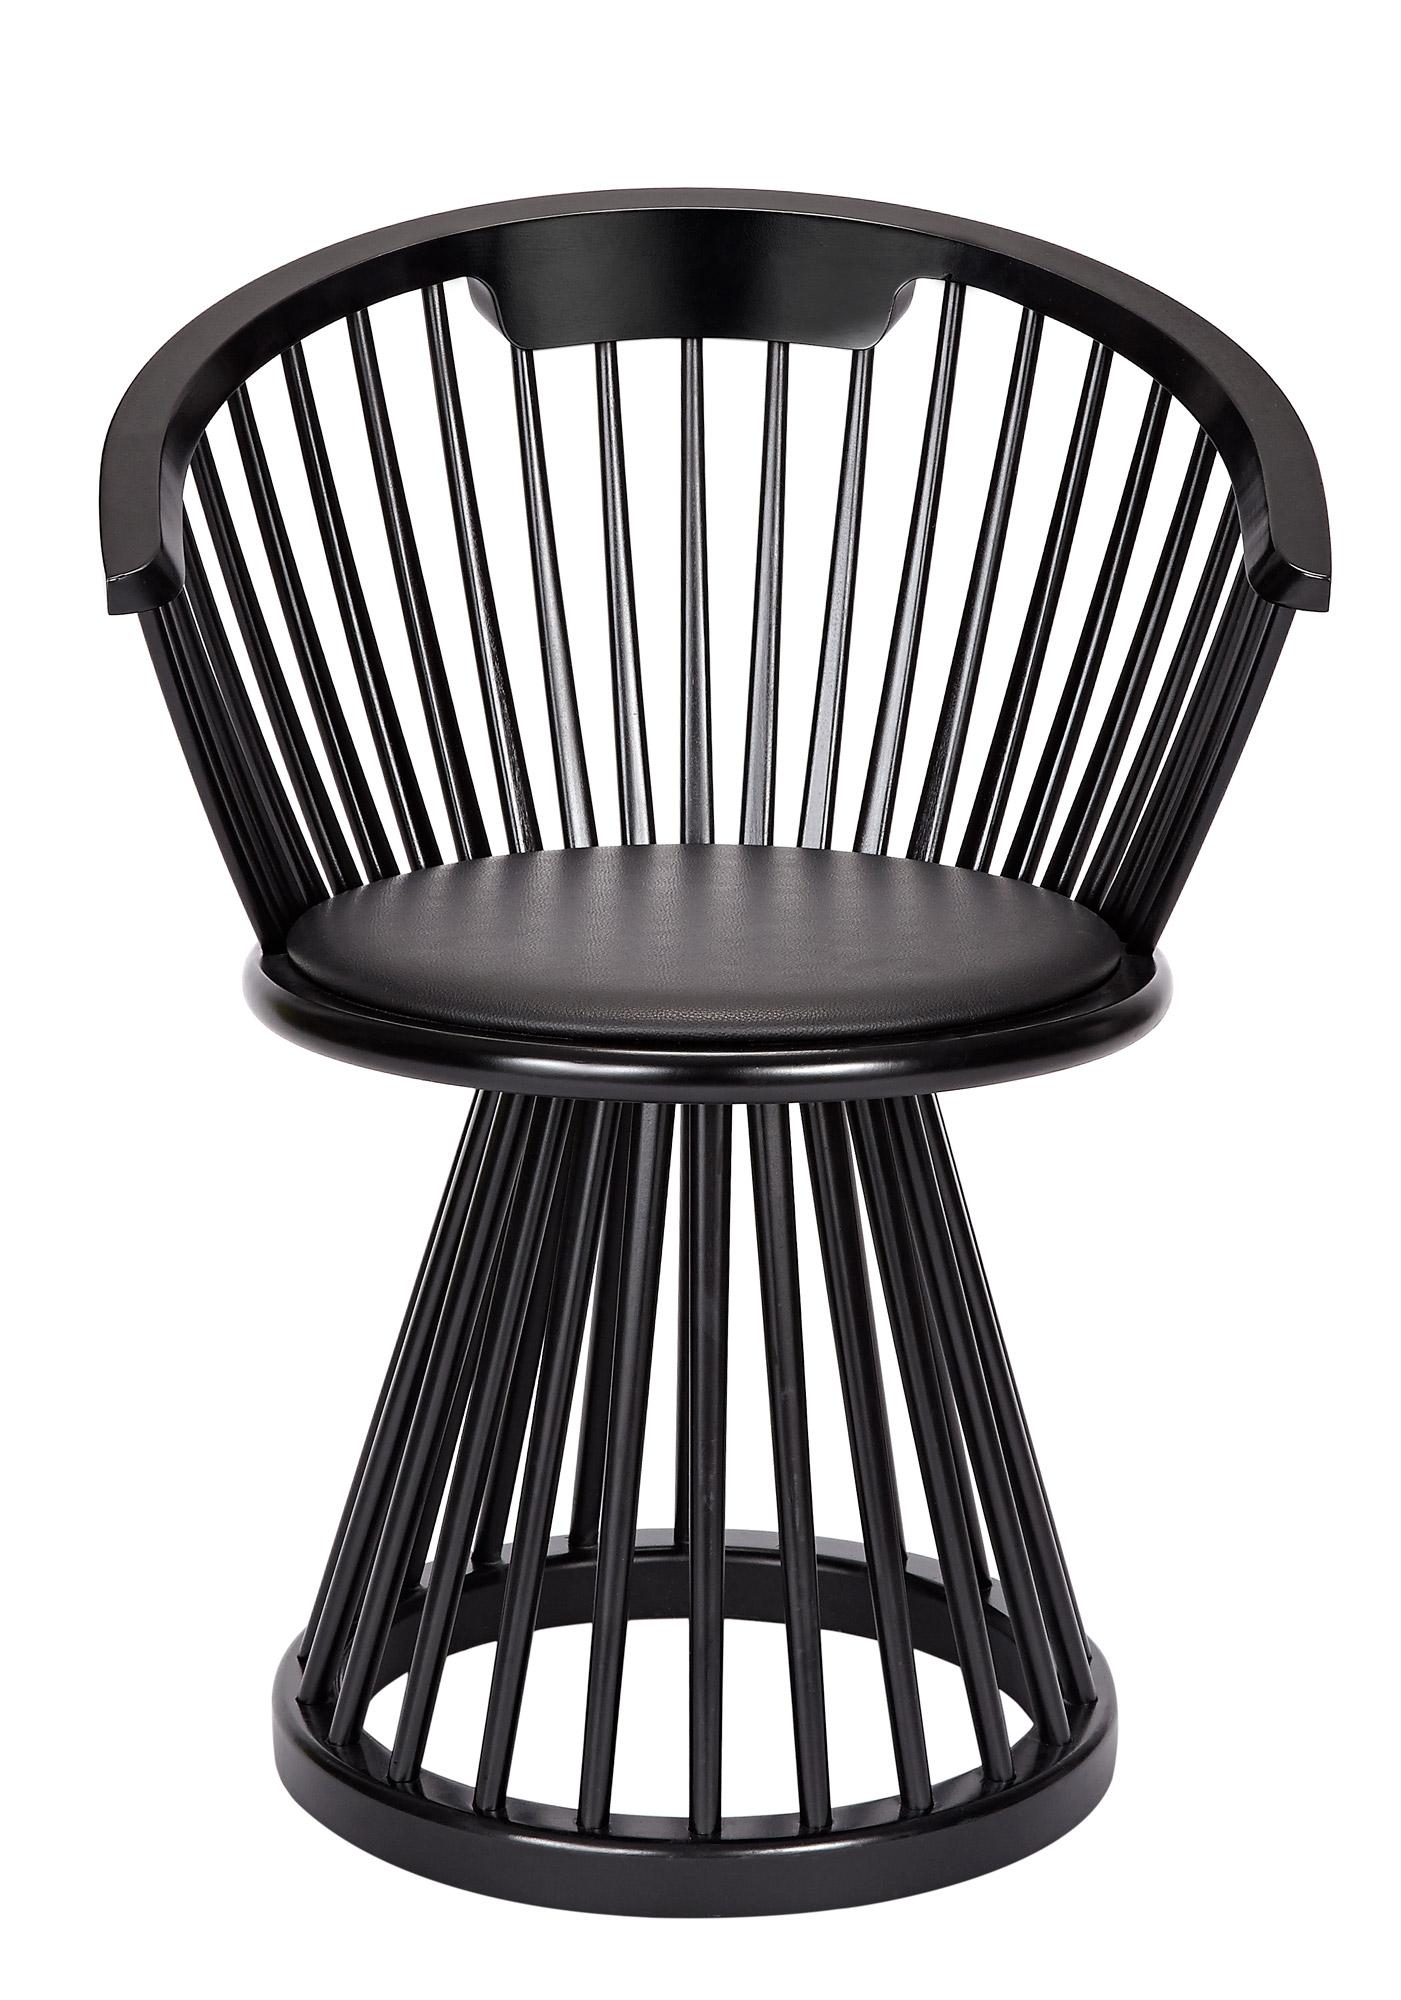 Tom Dixon Fan Dining Chair Tom Dixon